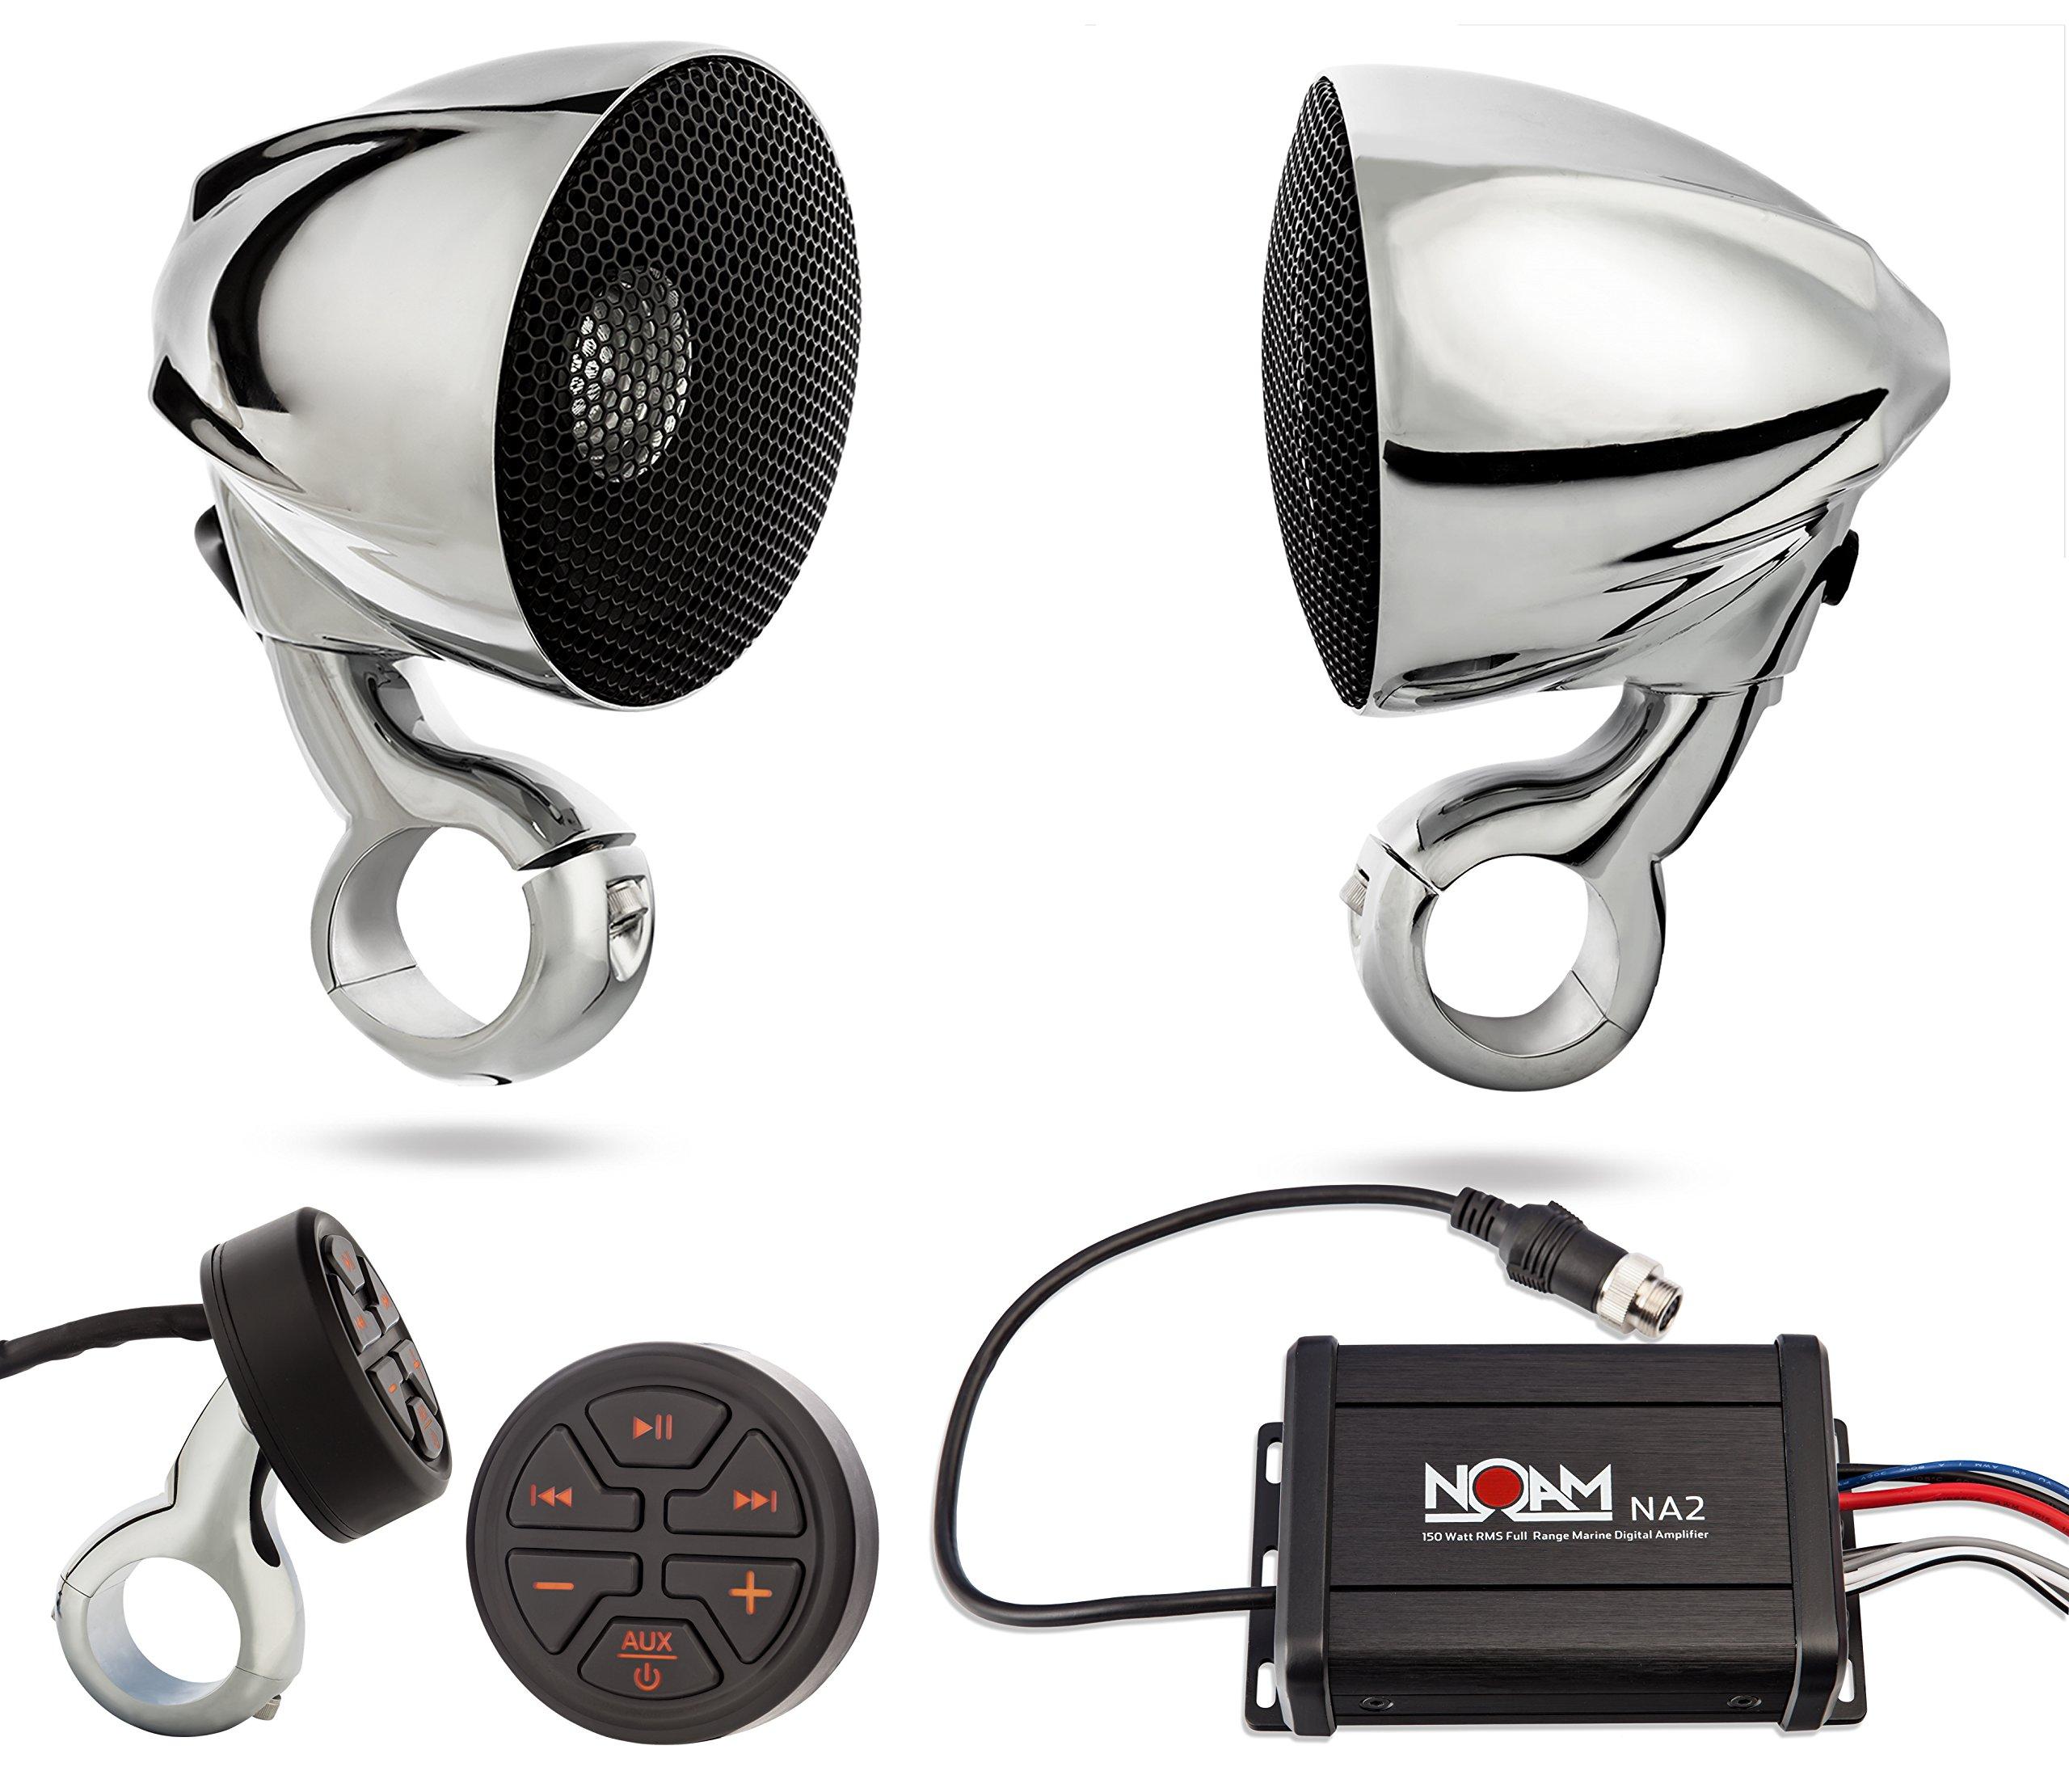 NOAM NMC3 - Waterproof Motorcycle/ATV Chrome Speakers Bluetooth Stereo System